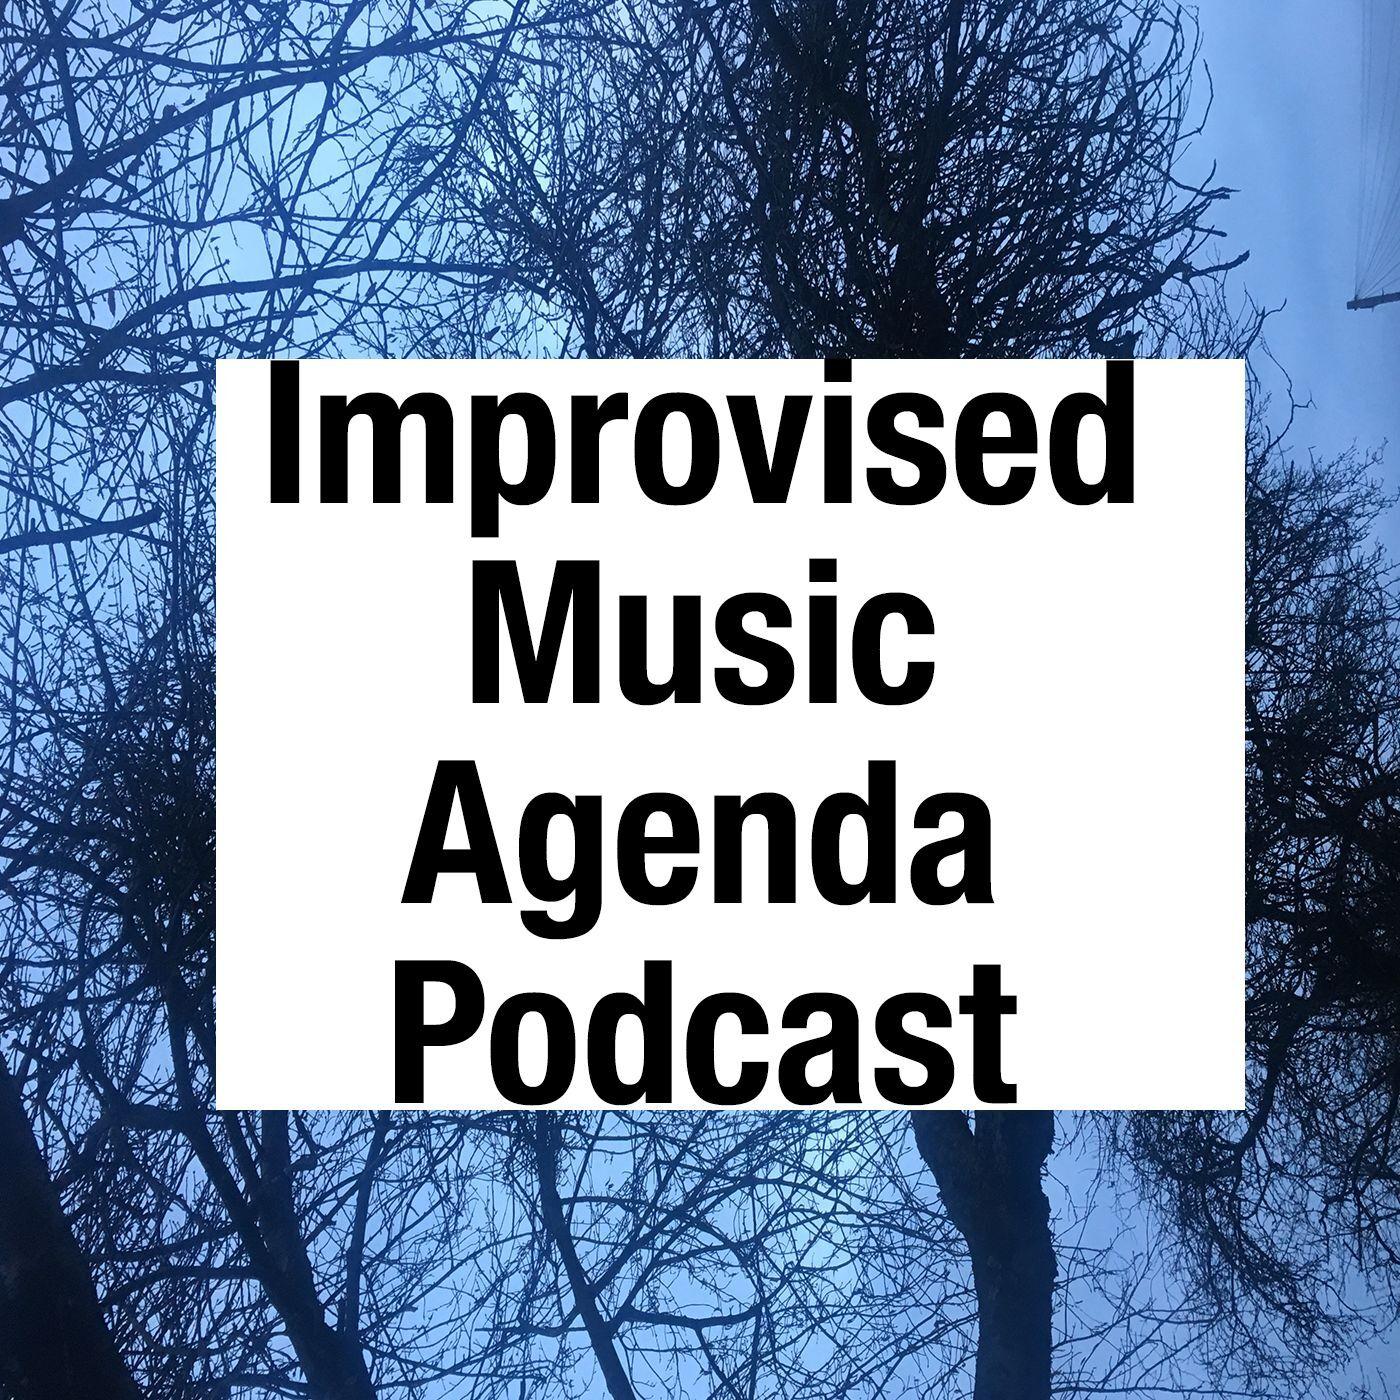 Buzzsprout | Episode 25: Corey Mwamba - Improvised Music Agenda Podcast